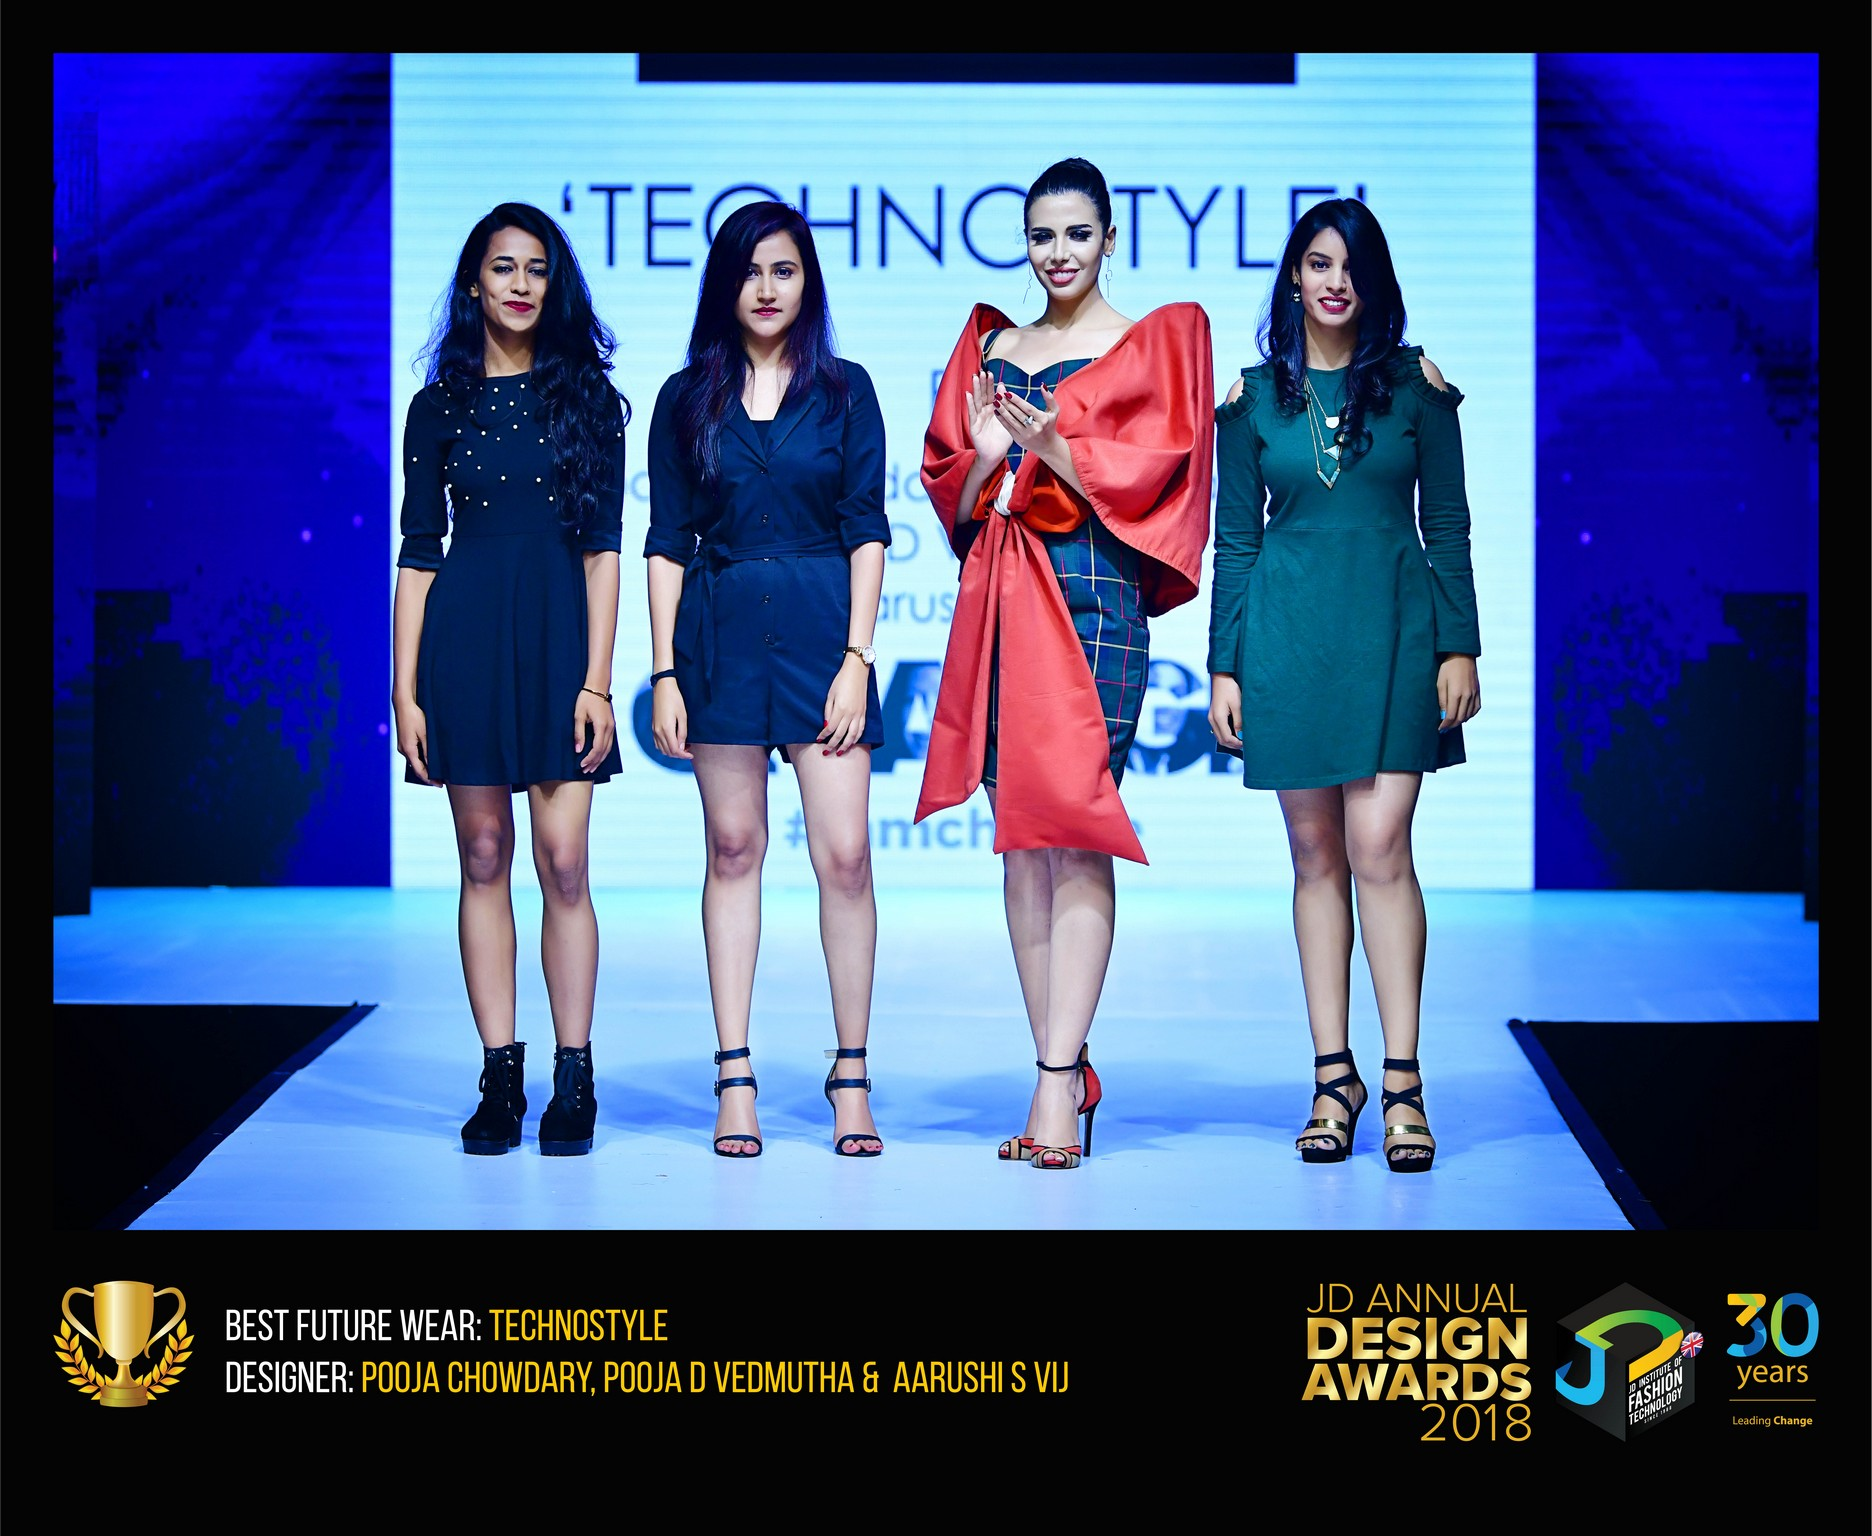 Techno style – Change – JD Annual Design Awards 2018 | Designer: M. Pooja, Pooja.D | Photography : Jerin Nath (@jerin_nath) techno style Techno style – Change – JD Annual Design Awards 2018 Technostyle7